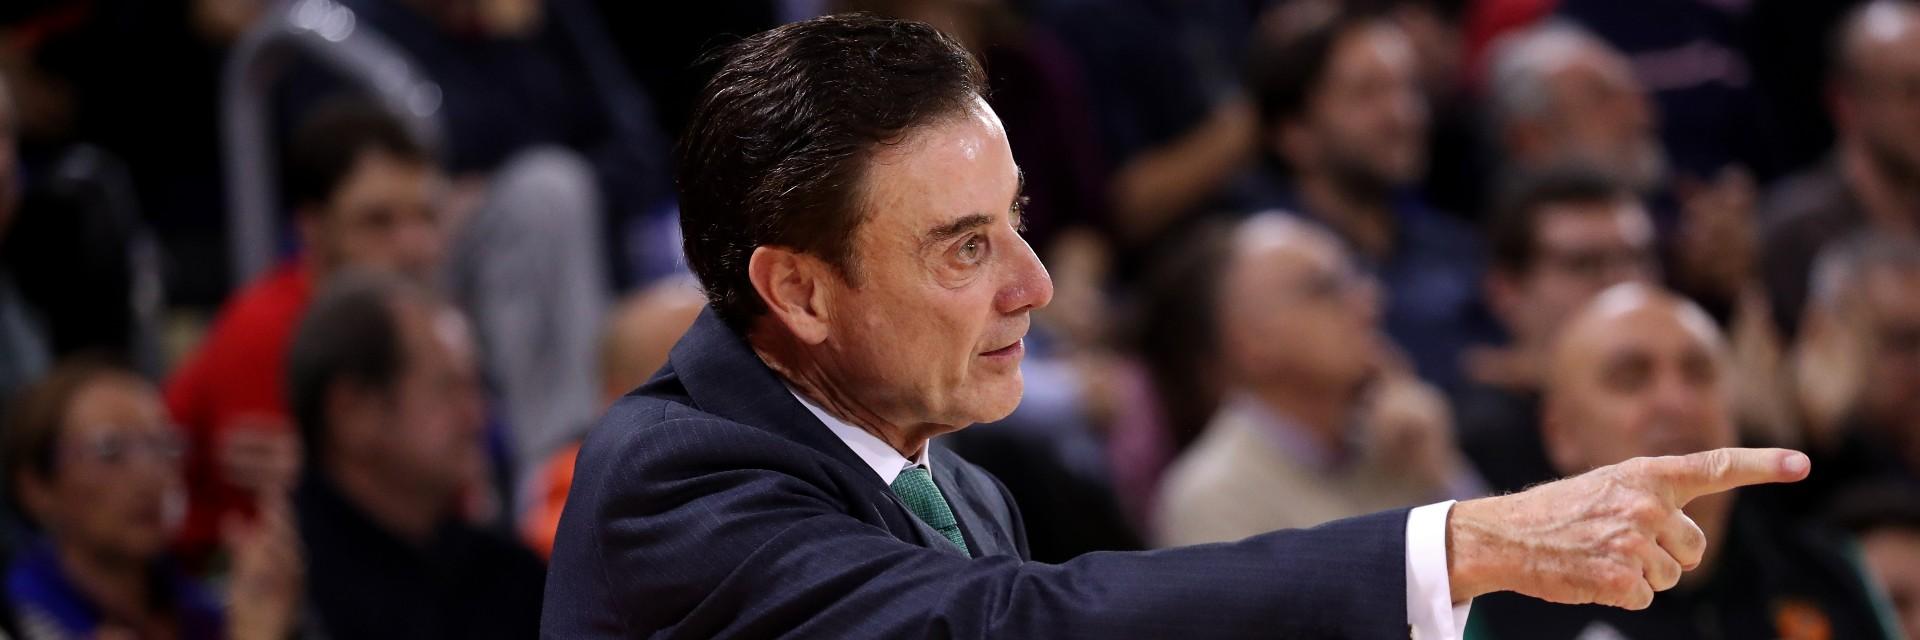 ncaa-college basketball-betting-odds-picks-december 8